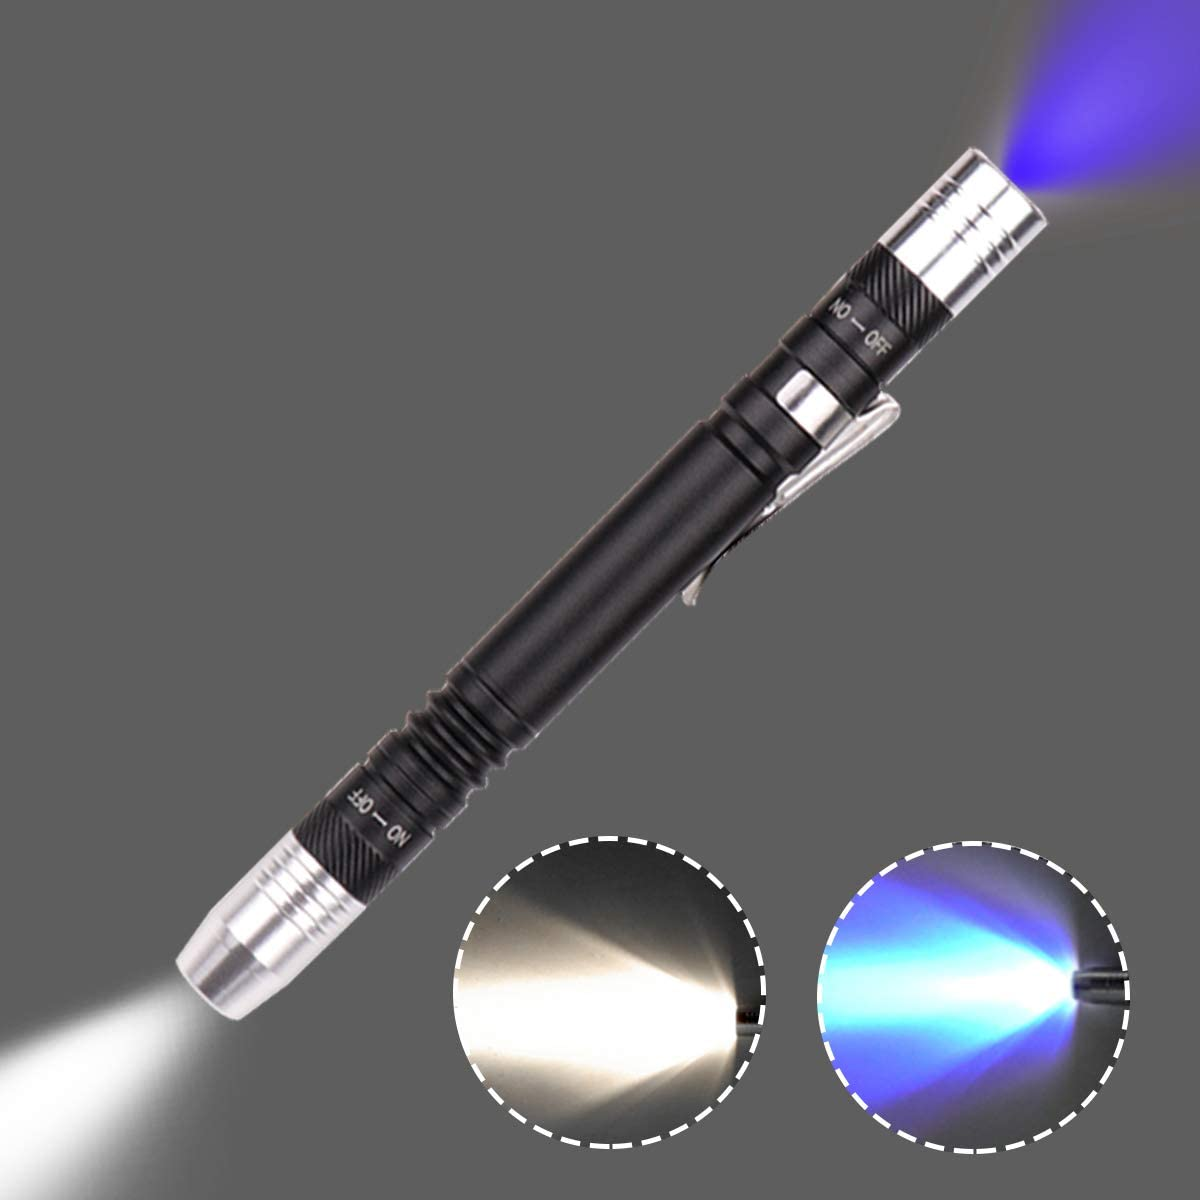 Detector de luz de la linterna Antorcha ultravioleta ultravioleta blanco púrpura para prueba Mini pluma UV linterna 395nm 2 en 1 linterna UV LED Fuente de luz Penlight Blacklight 2 (1 paquete)